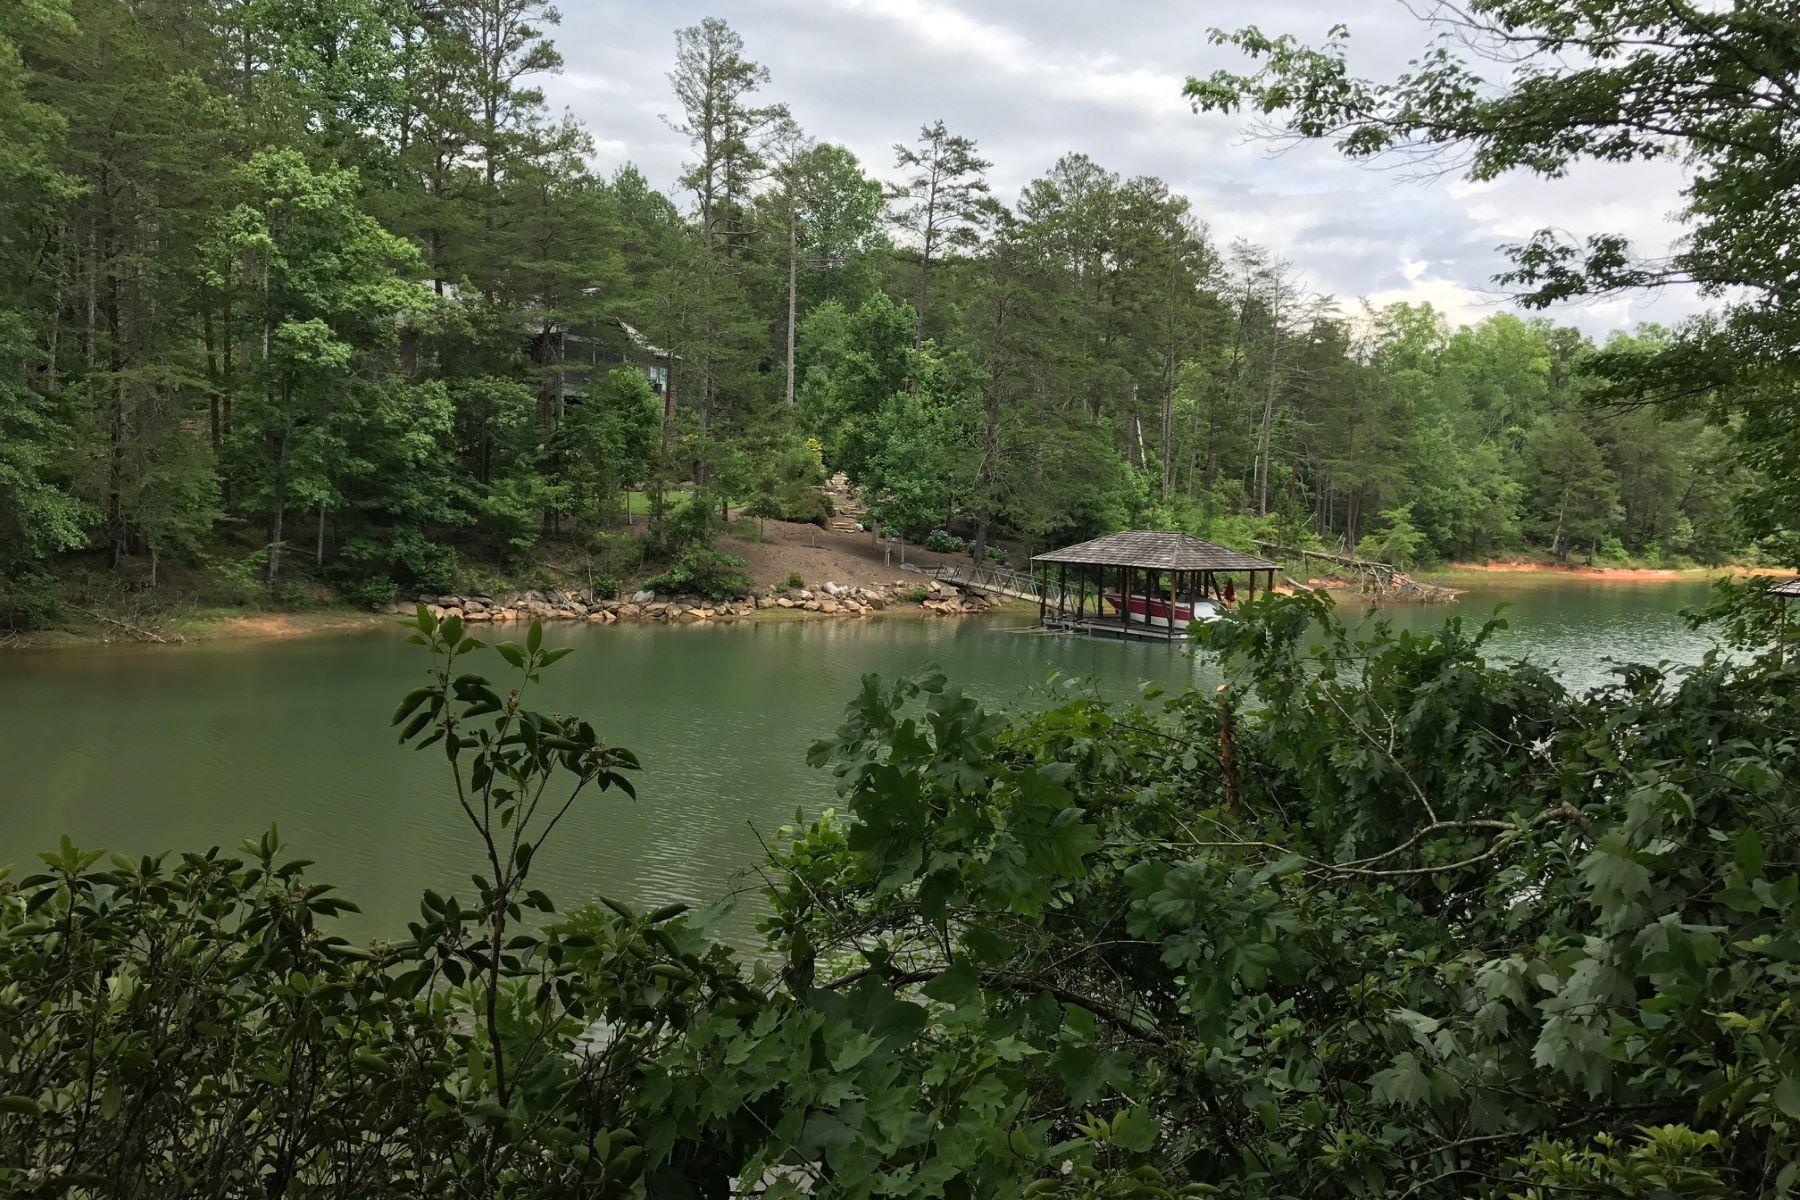 Land for Sale at Gentle Slope to Lake Keowee Shoreline RES E235, Sunset, South Carolina 29685 United States